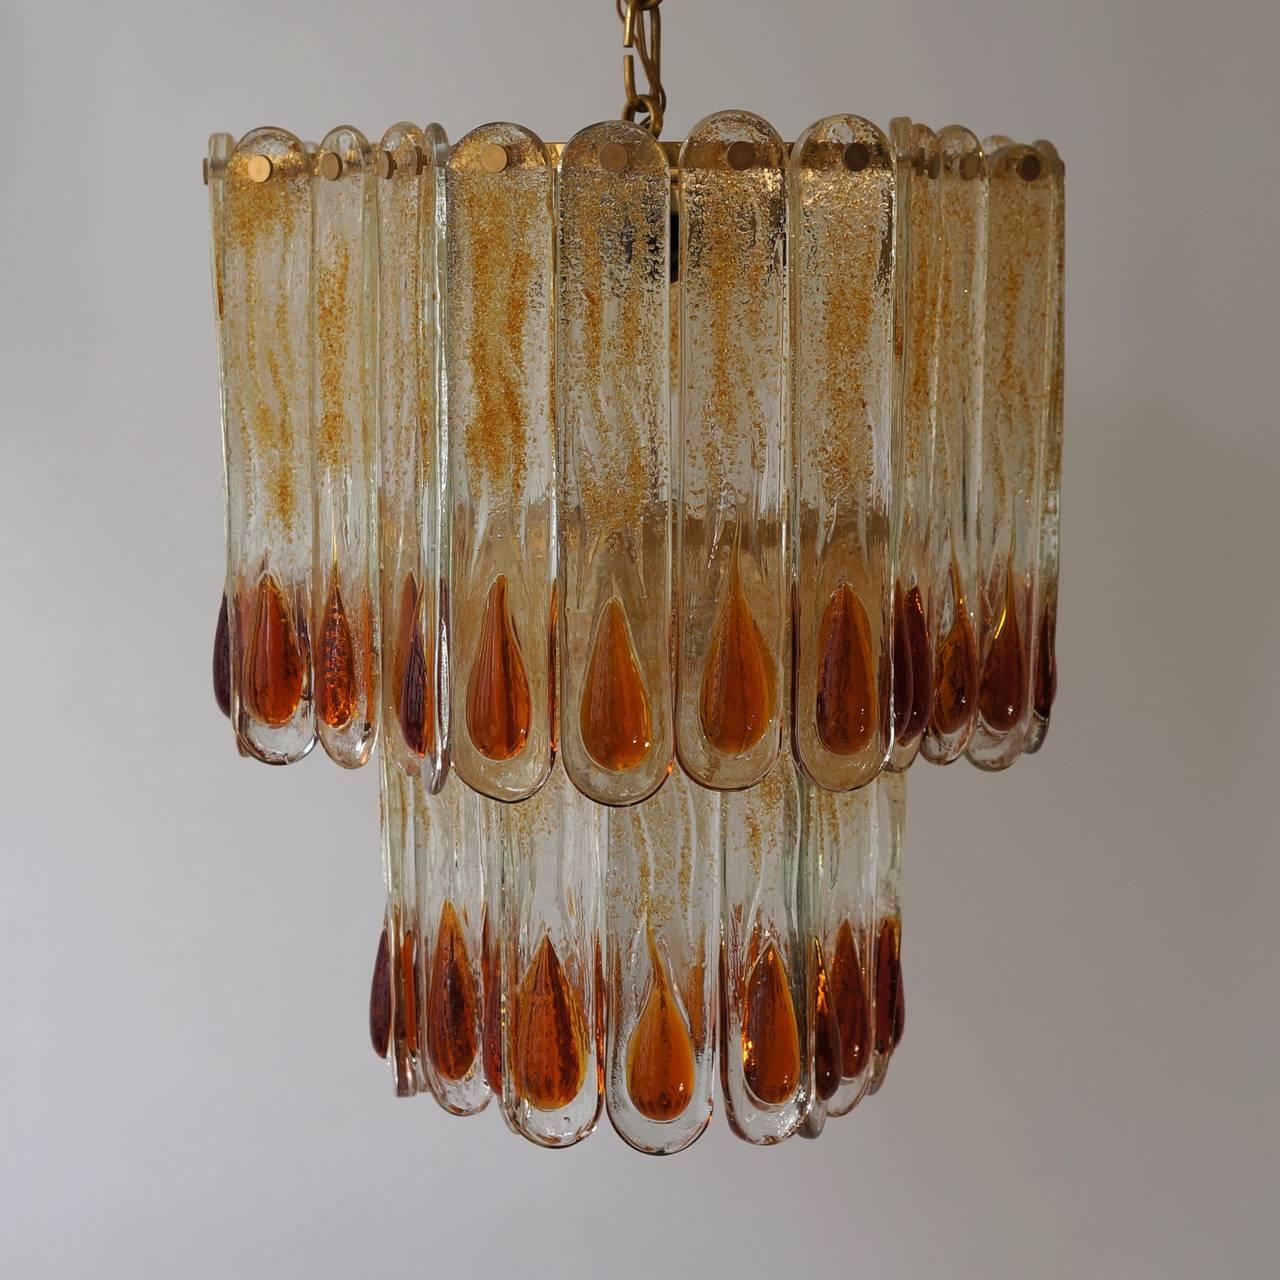 Brass Murano Chandelier For Sale